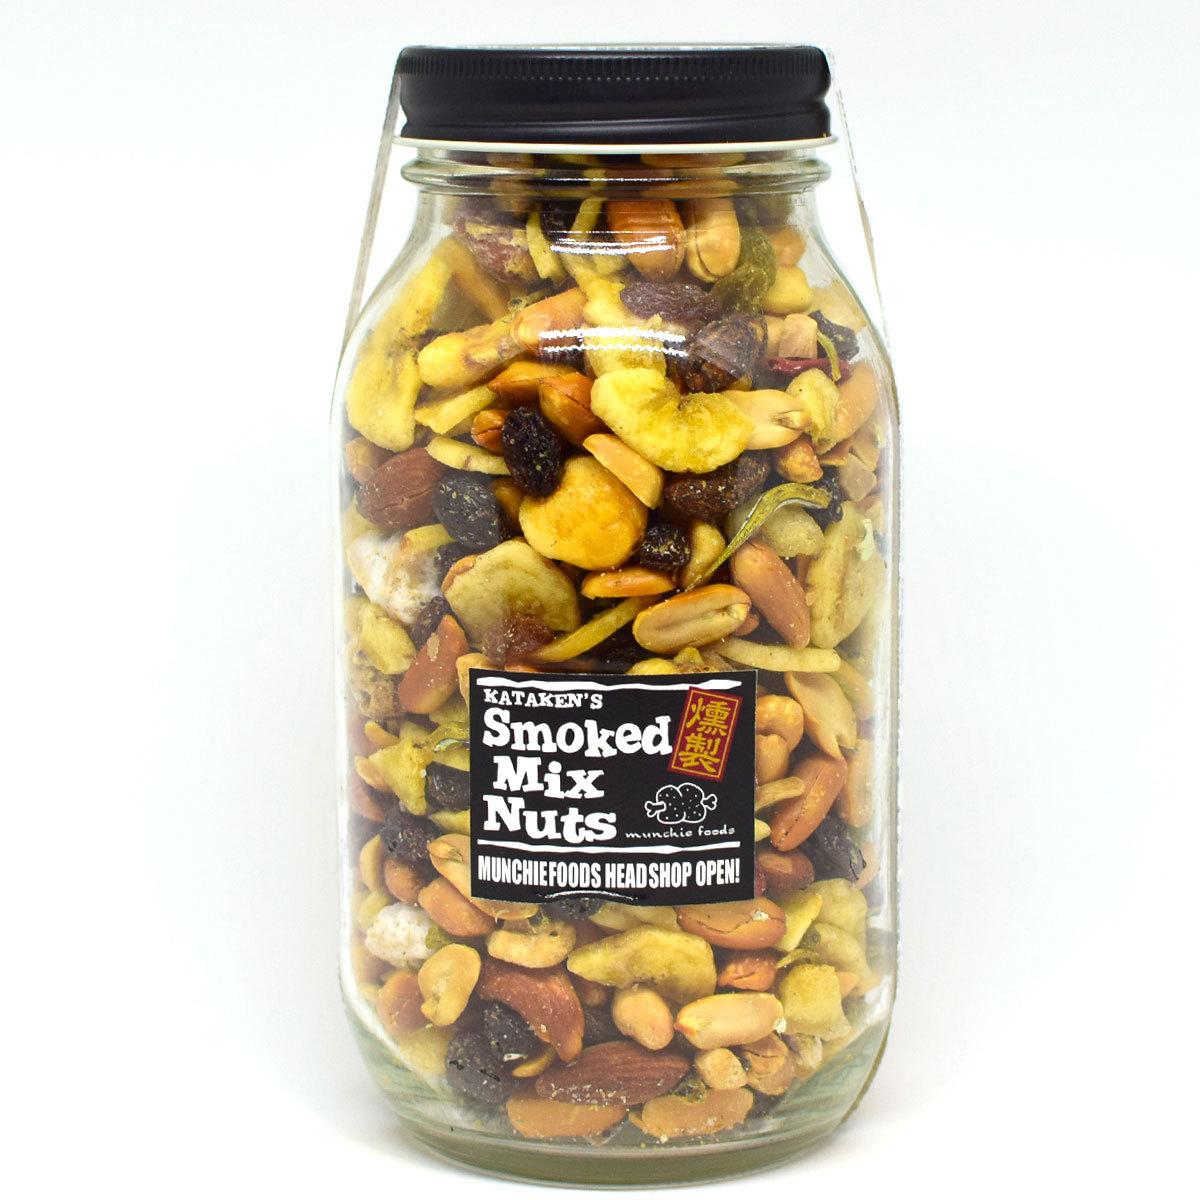 MUNCHIE FOODS(マンチーフーズ)Smoked Mix Nuts Large Bottle スモークドミックスナッツ 燻製